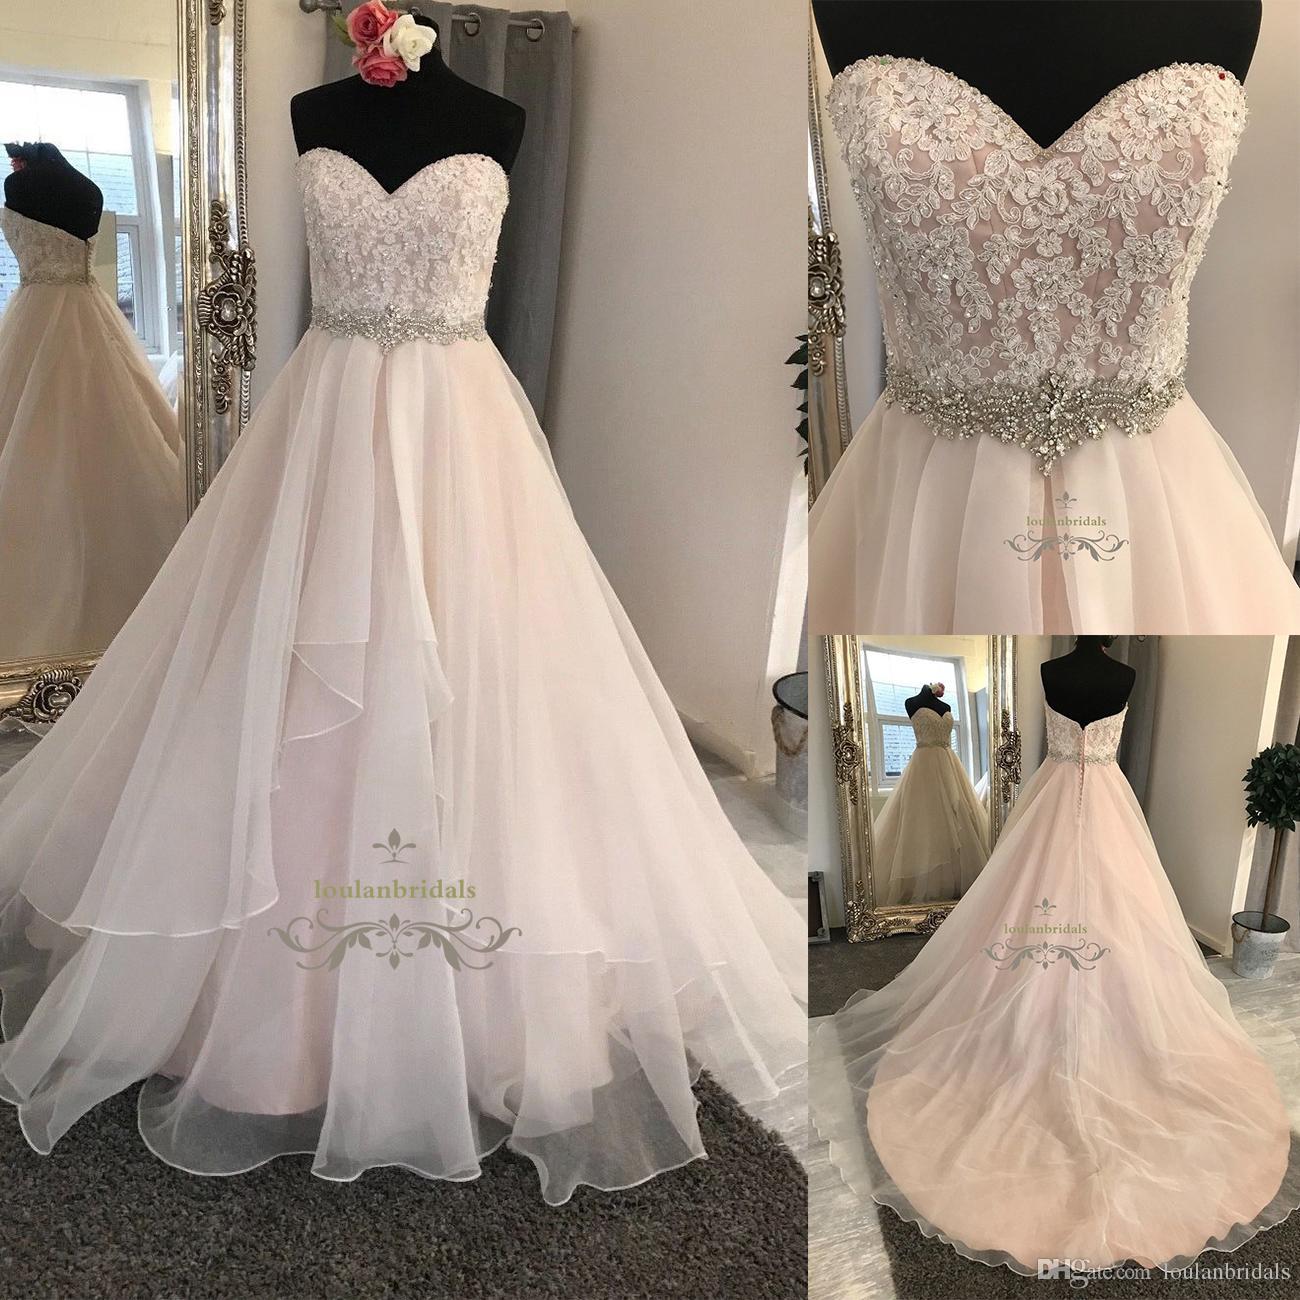 Beautiful With Blush Underlay Ball Gown/Duchess Glamourous Wedding ...